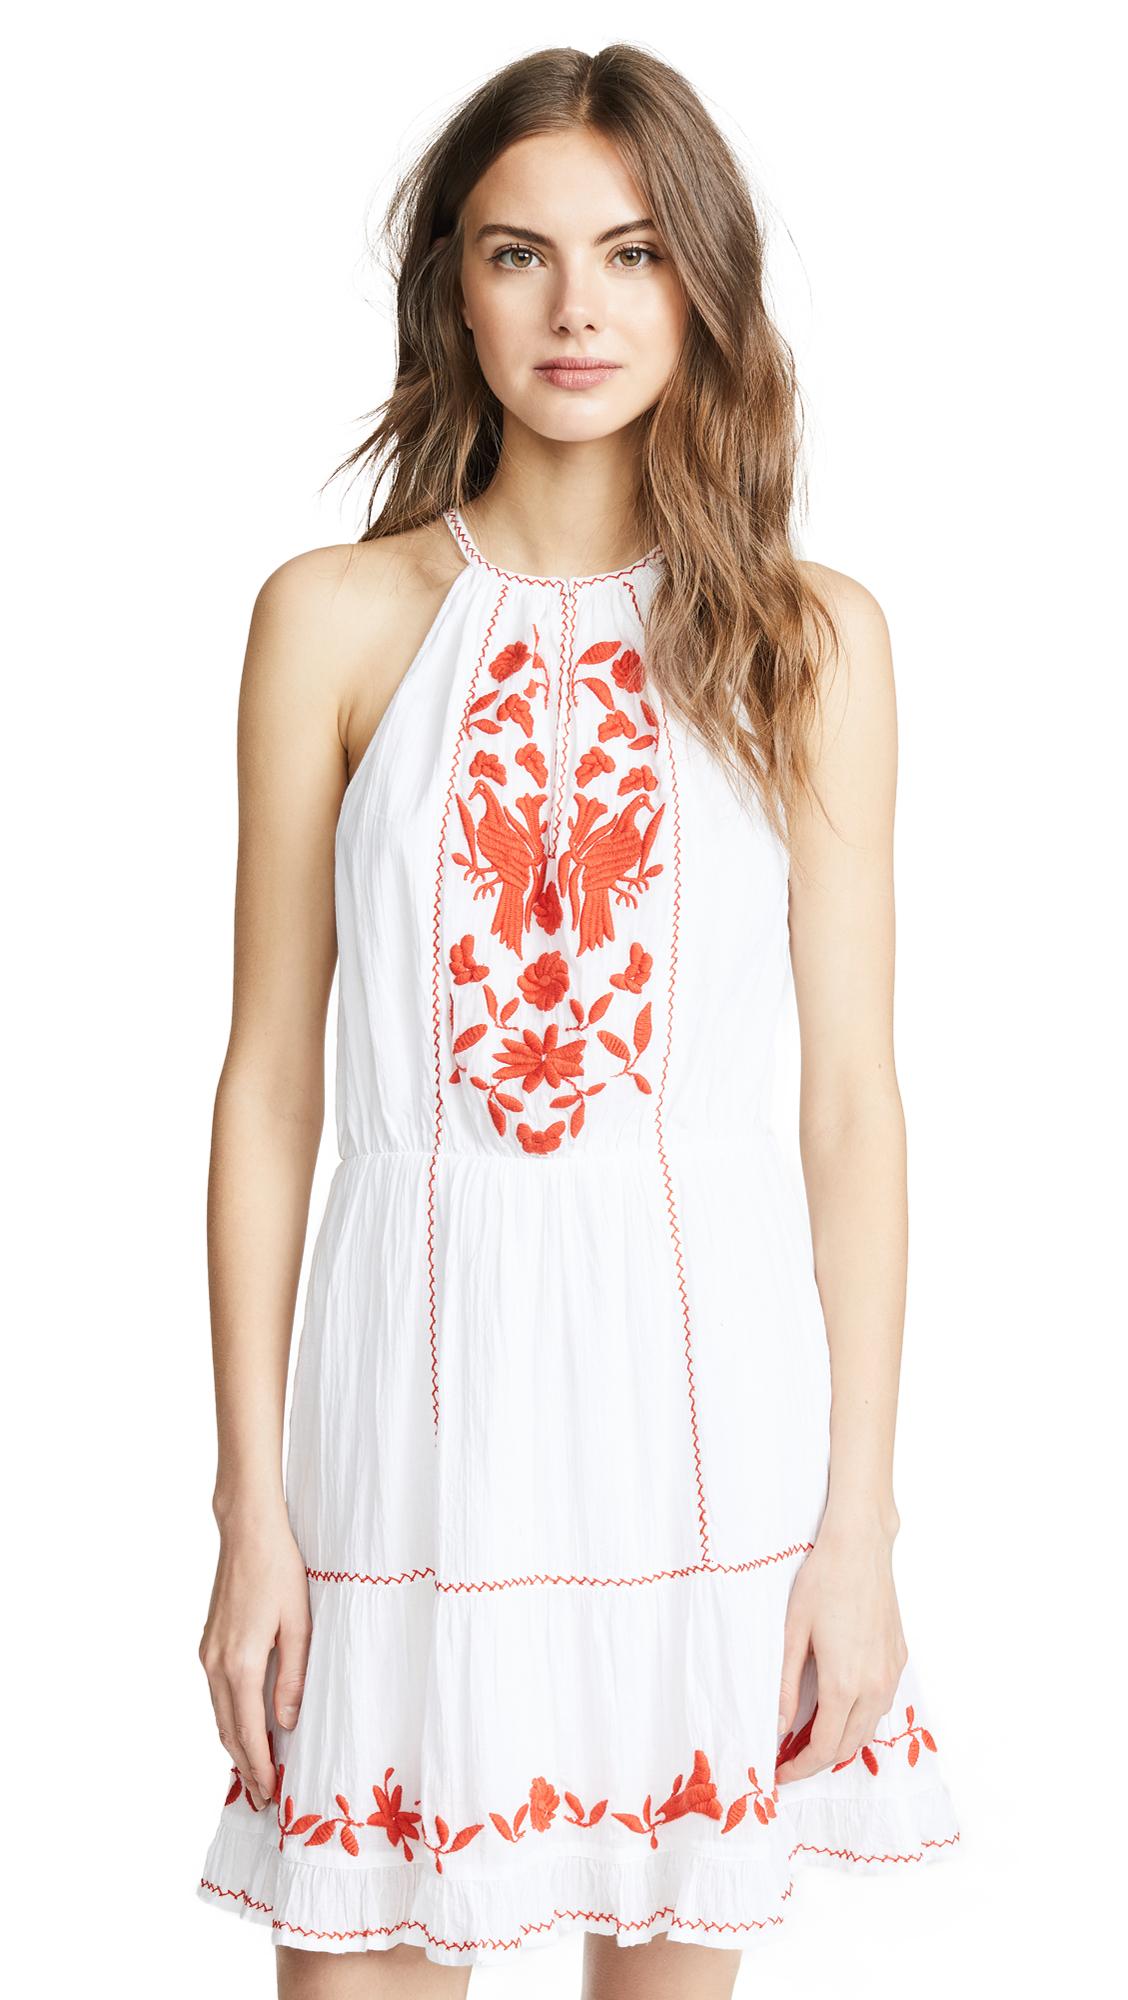 Joie Clemency Dress In Clean White/Salsa